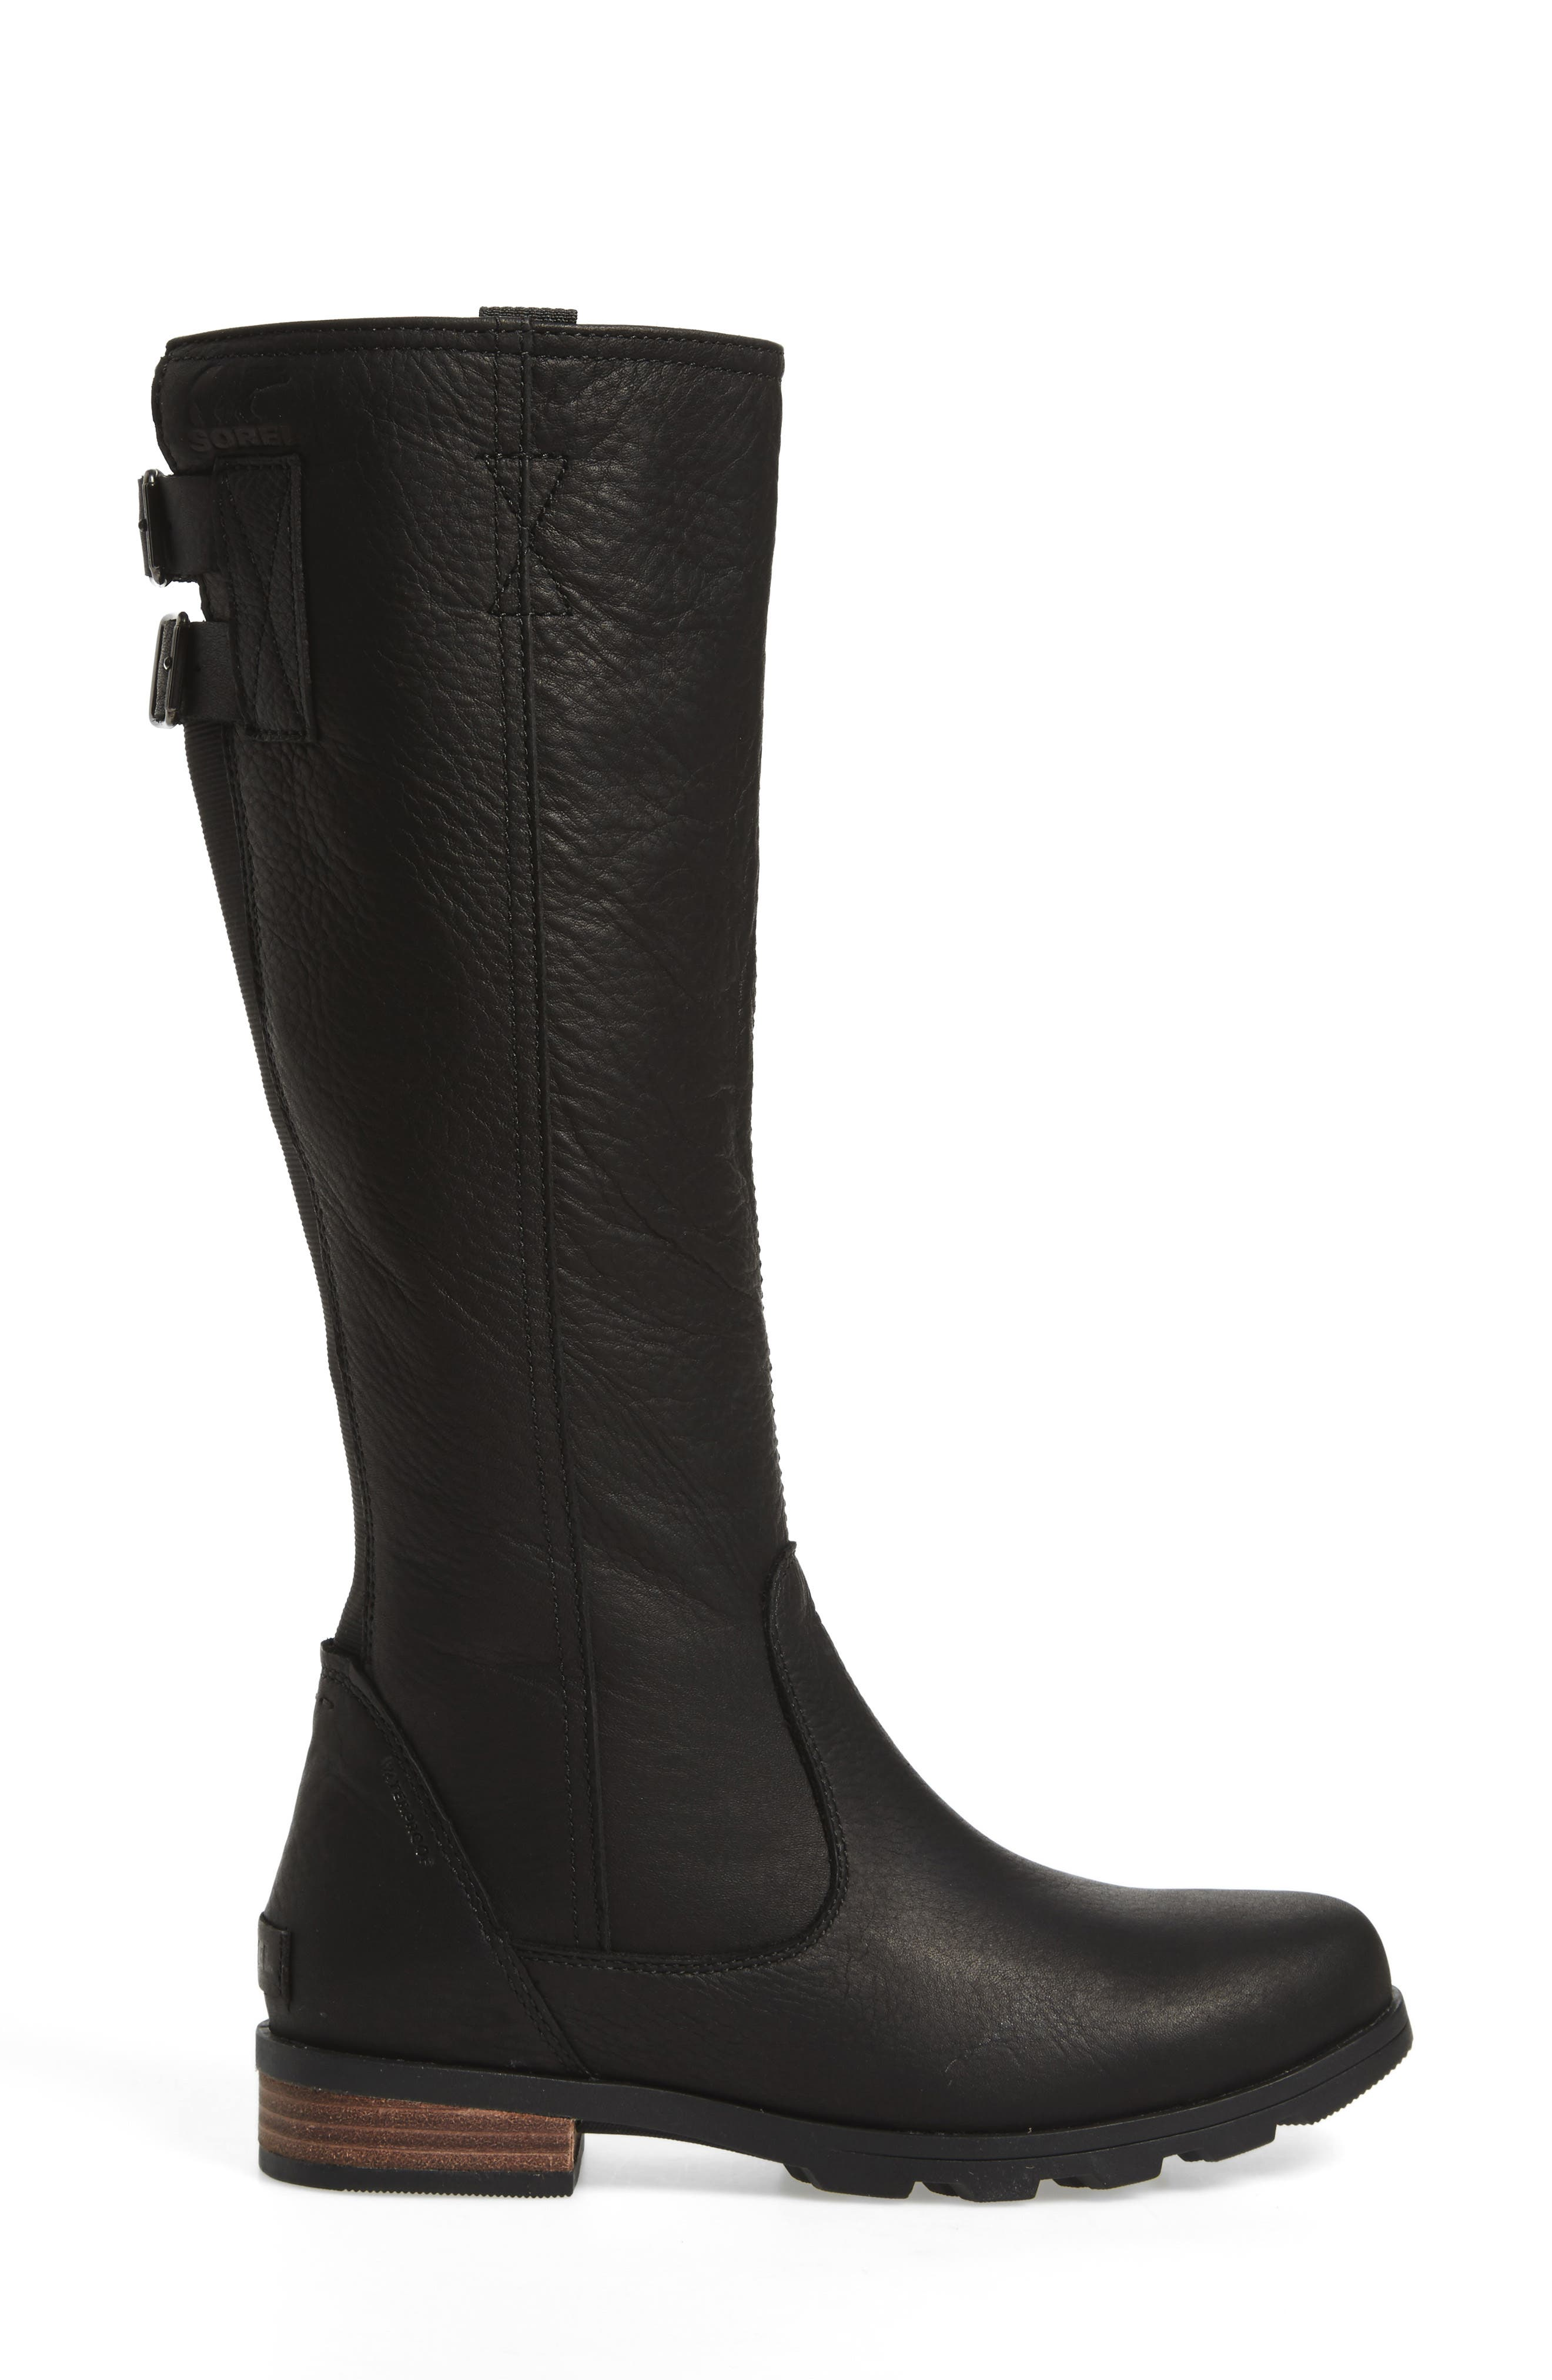 Alternate Image 3  - SOREL Emelie Premium Knee High Boot (Women)